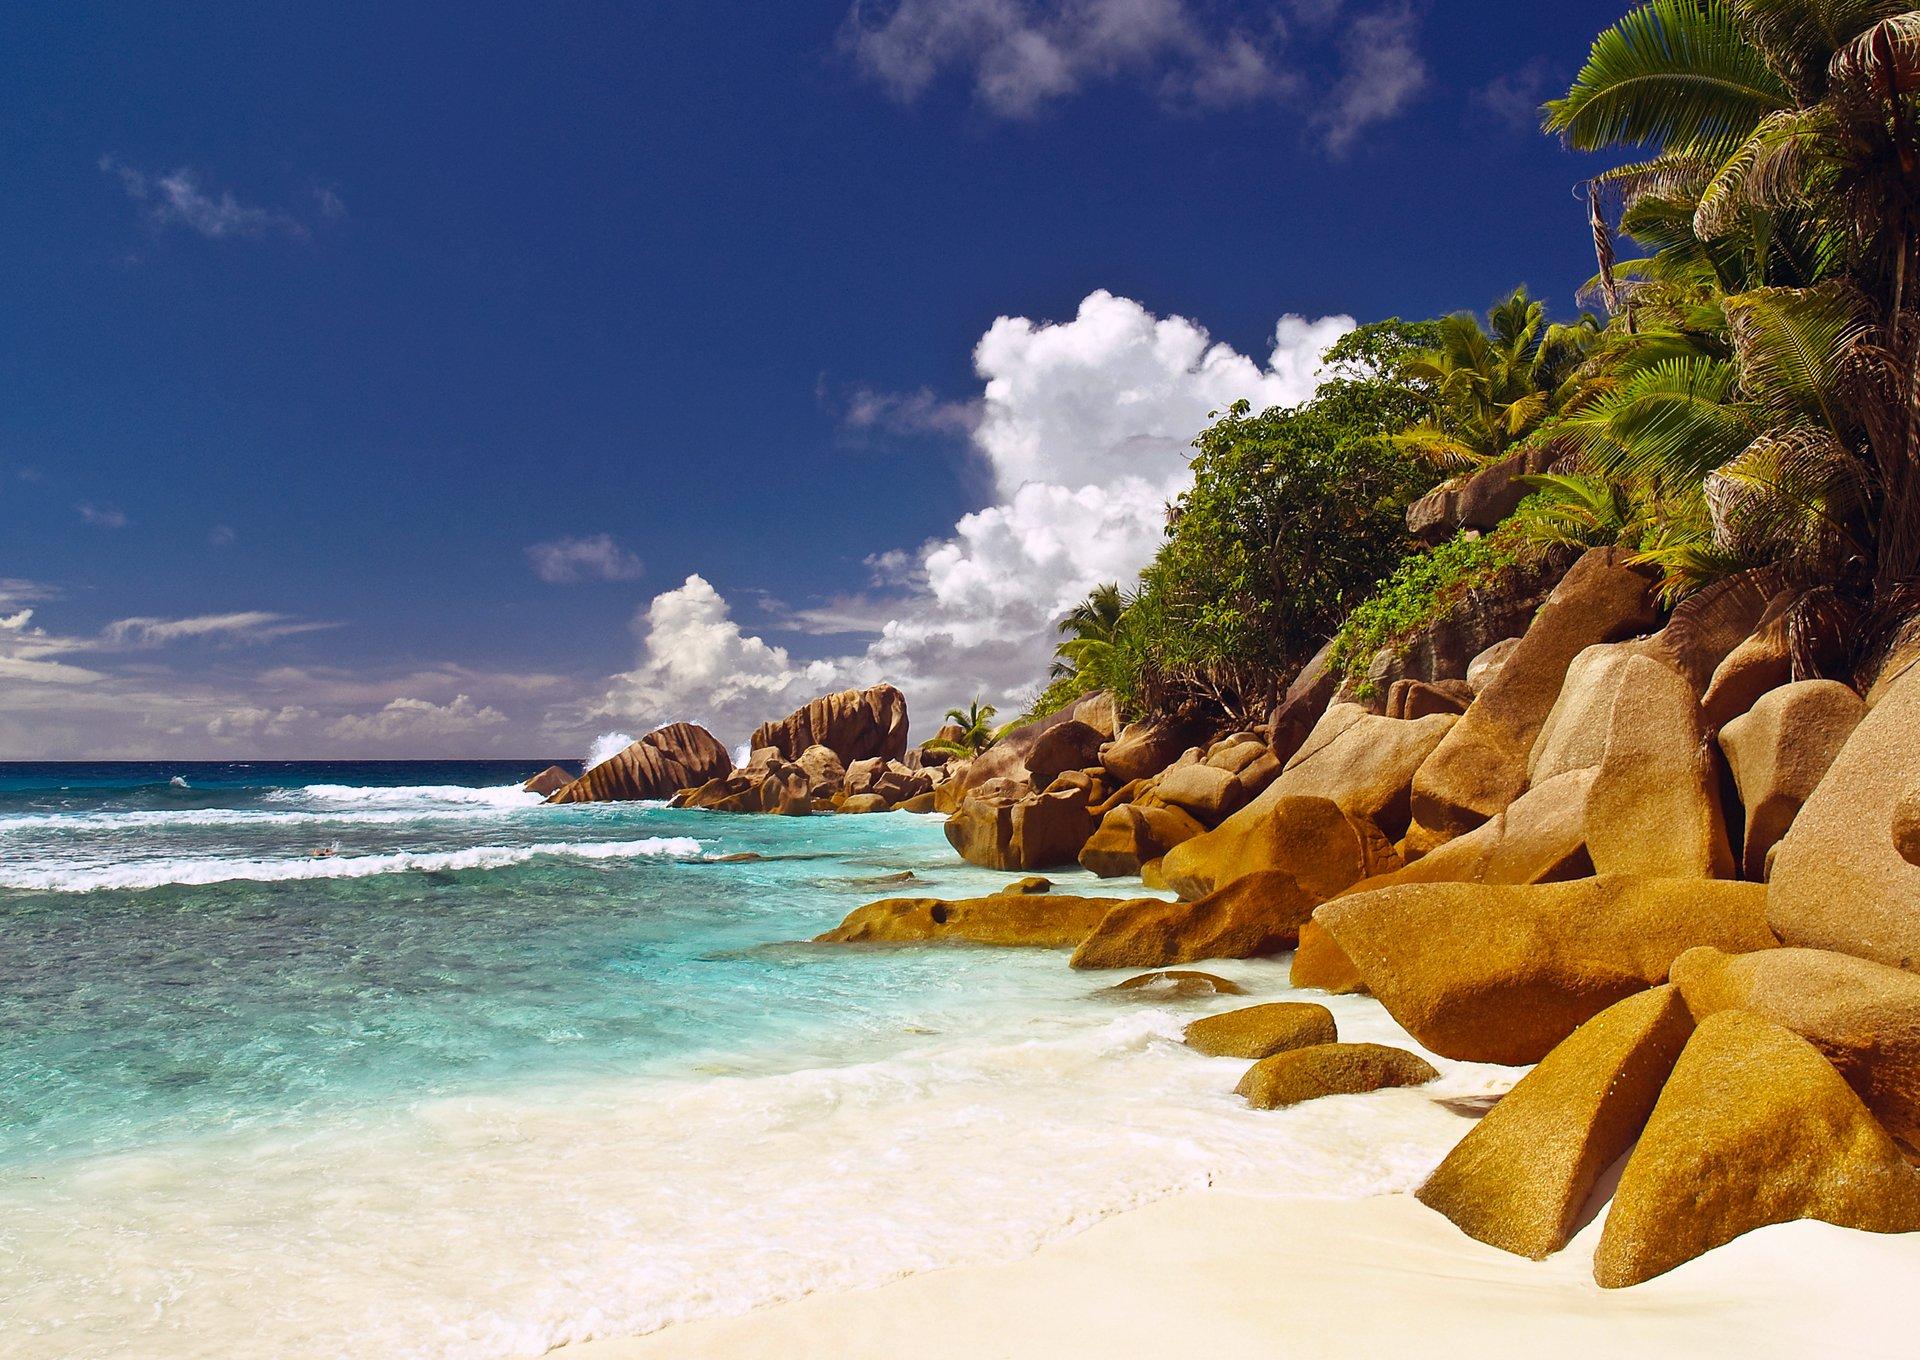 берег камни пальмы shore stones palm trees без смс